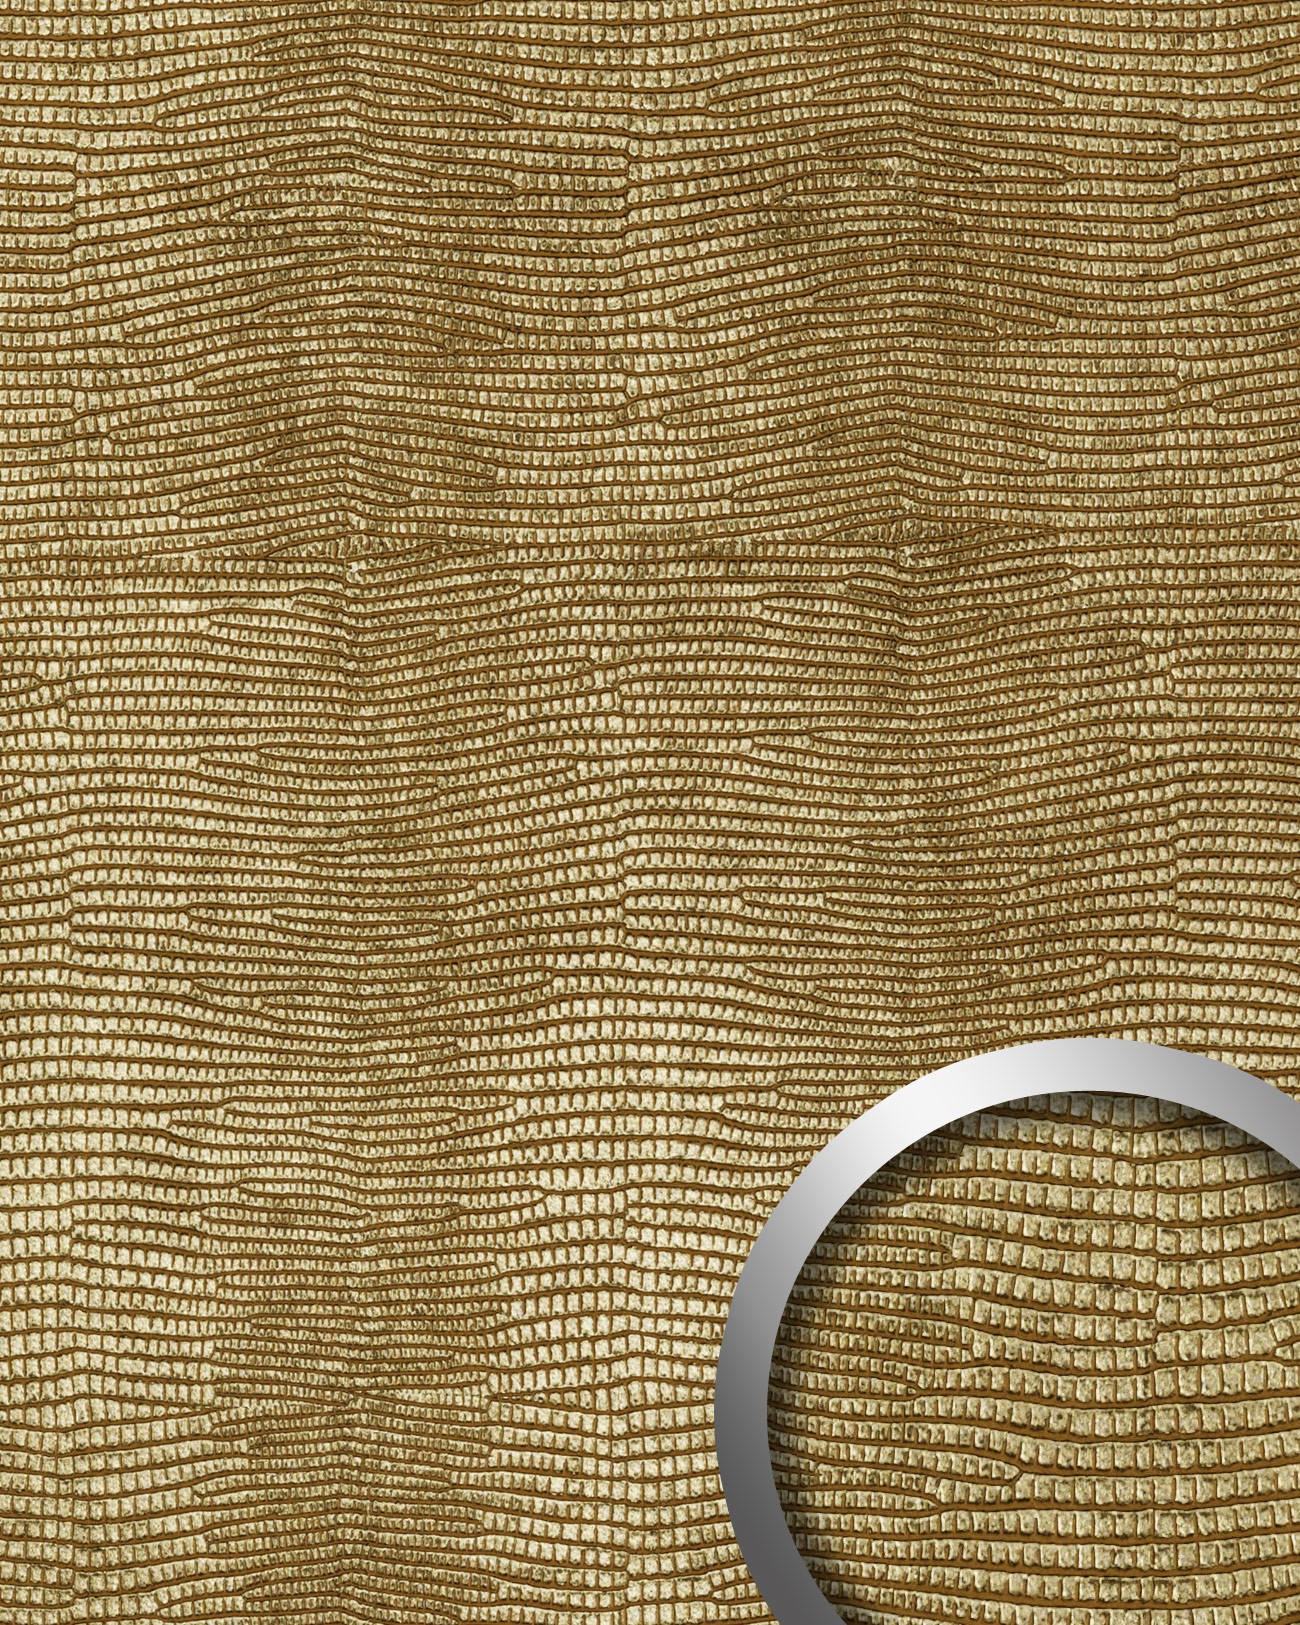 Wandpaneel D WallFace LEGUAN Leder Blickfang Luxus Dekor - Wandpaneele auf fliesen kleben